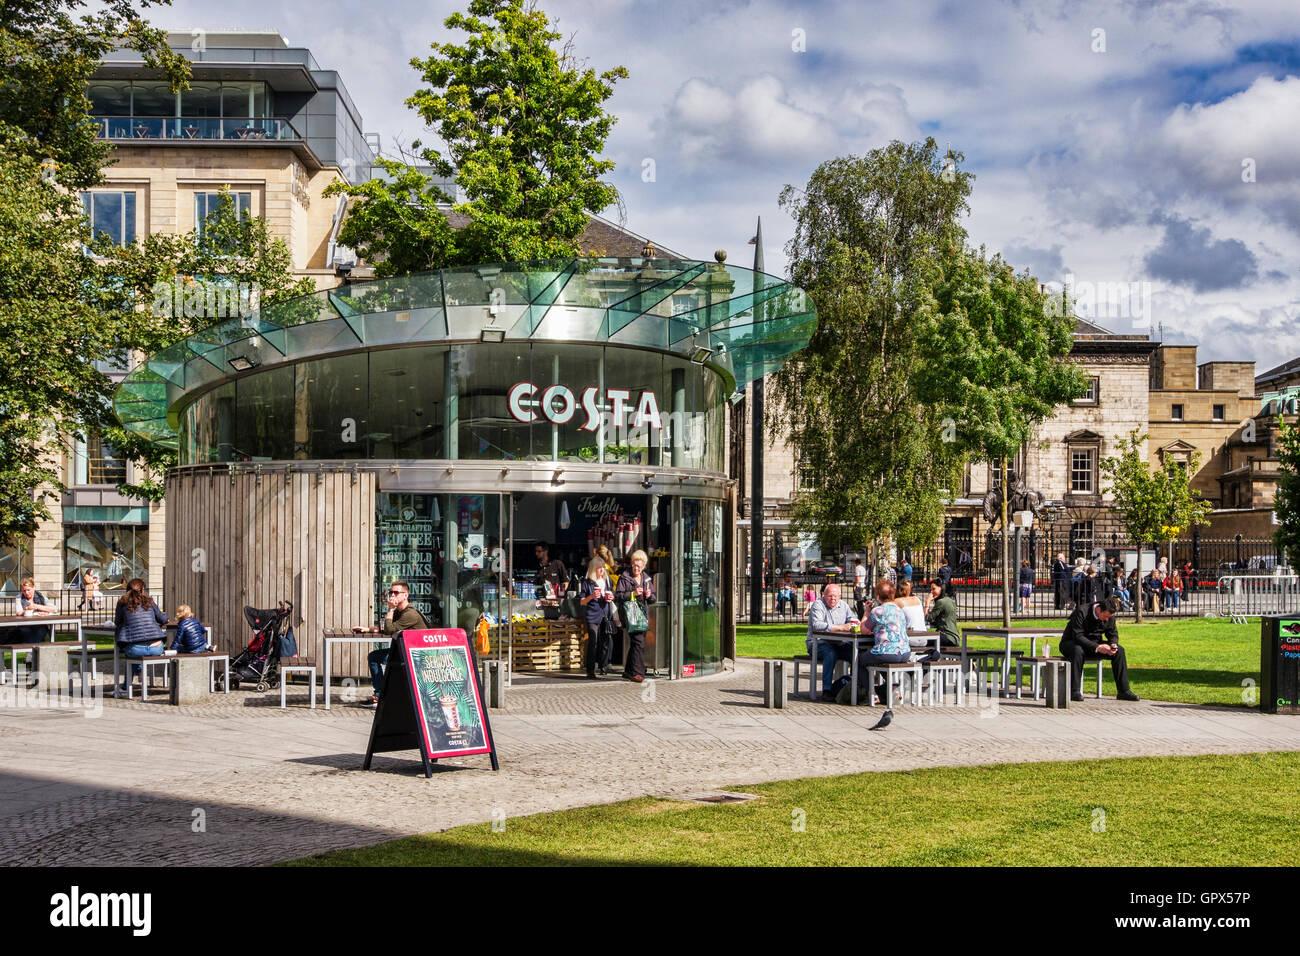 Costa coffee shop à St Andrew Square, Édimbourg, Écosse. Photo Stock